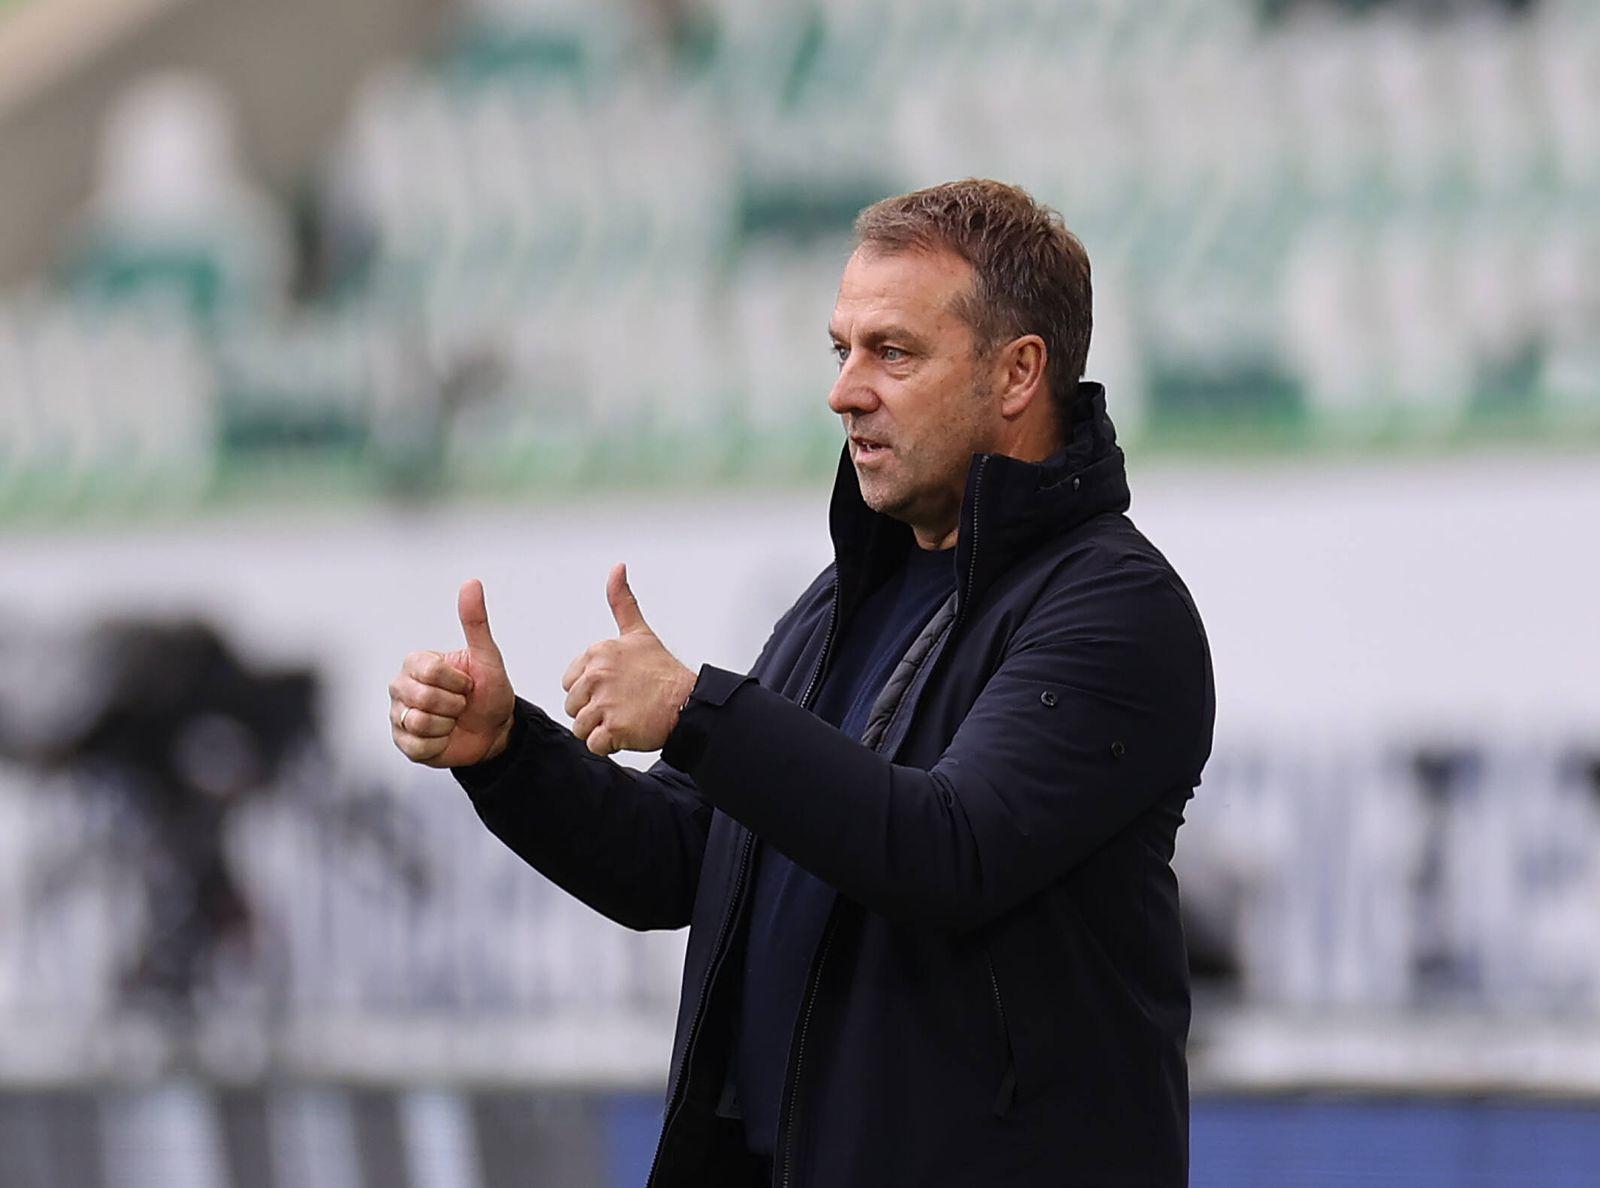 Daumen hoch nach dem 0-2 Cheftrainer Hansi Flick (FC Bayern Muenchen) DFL REGULATIONS PROHIBIT ANY USE OF PHOTOGRAPHS AS